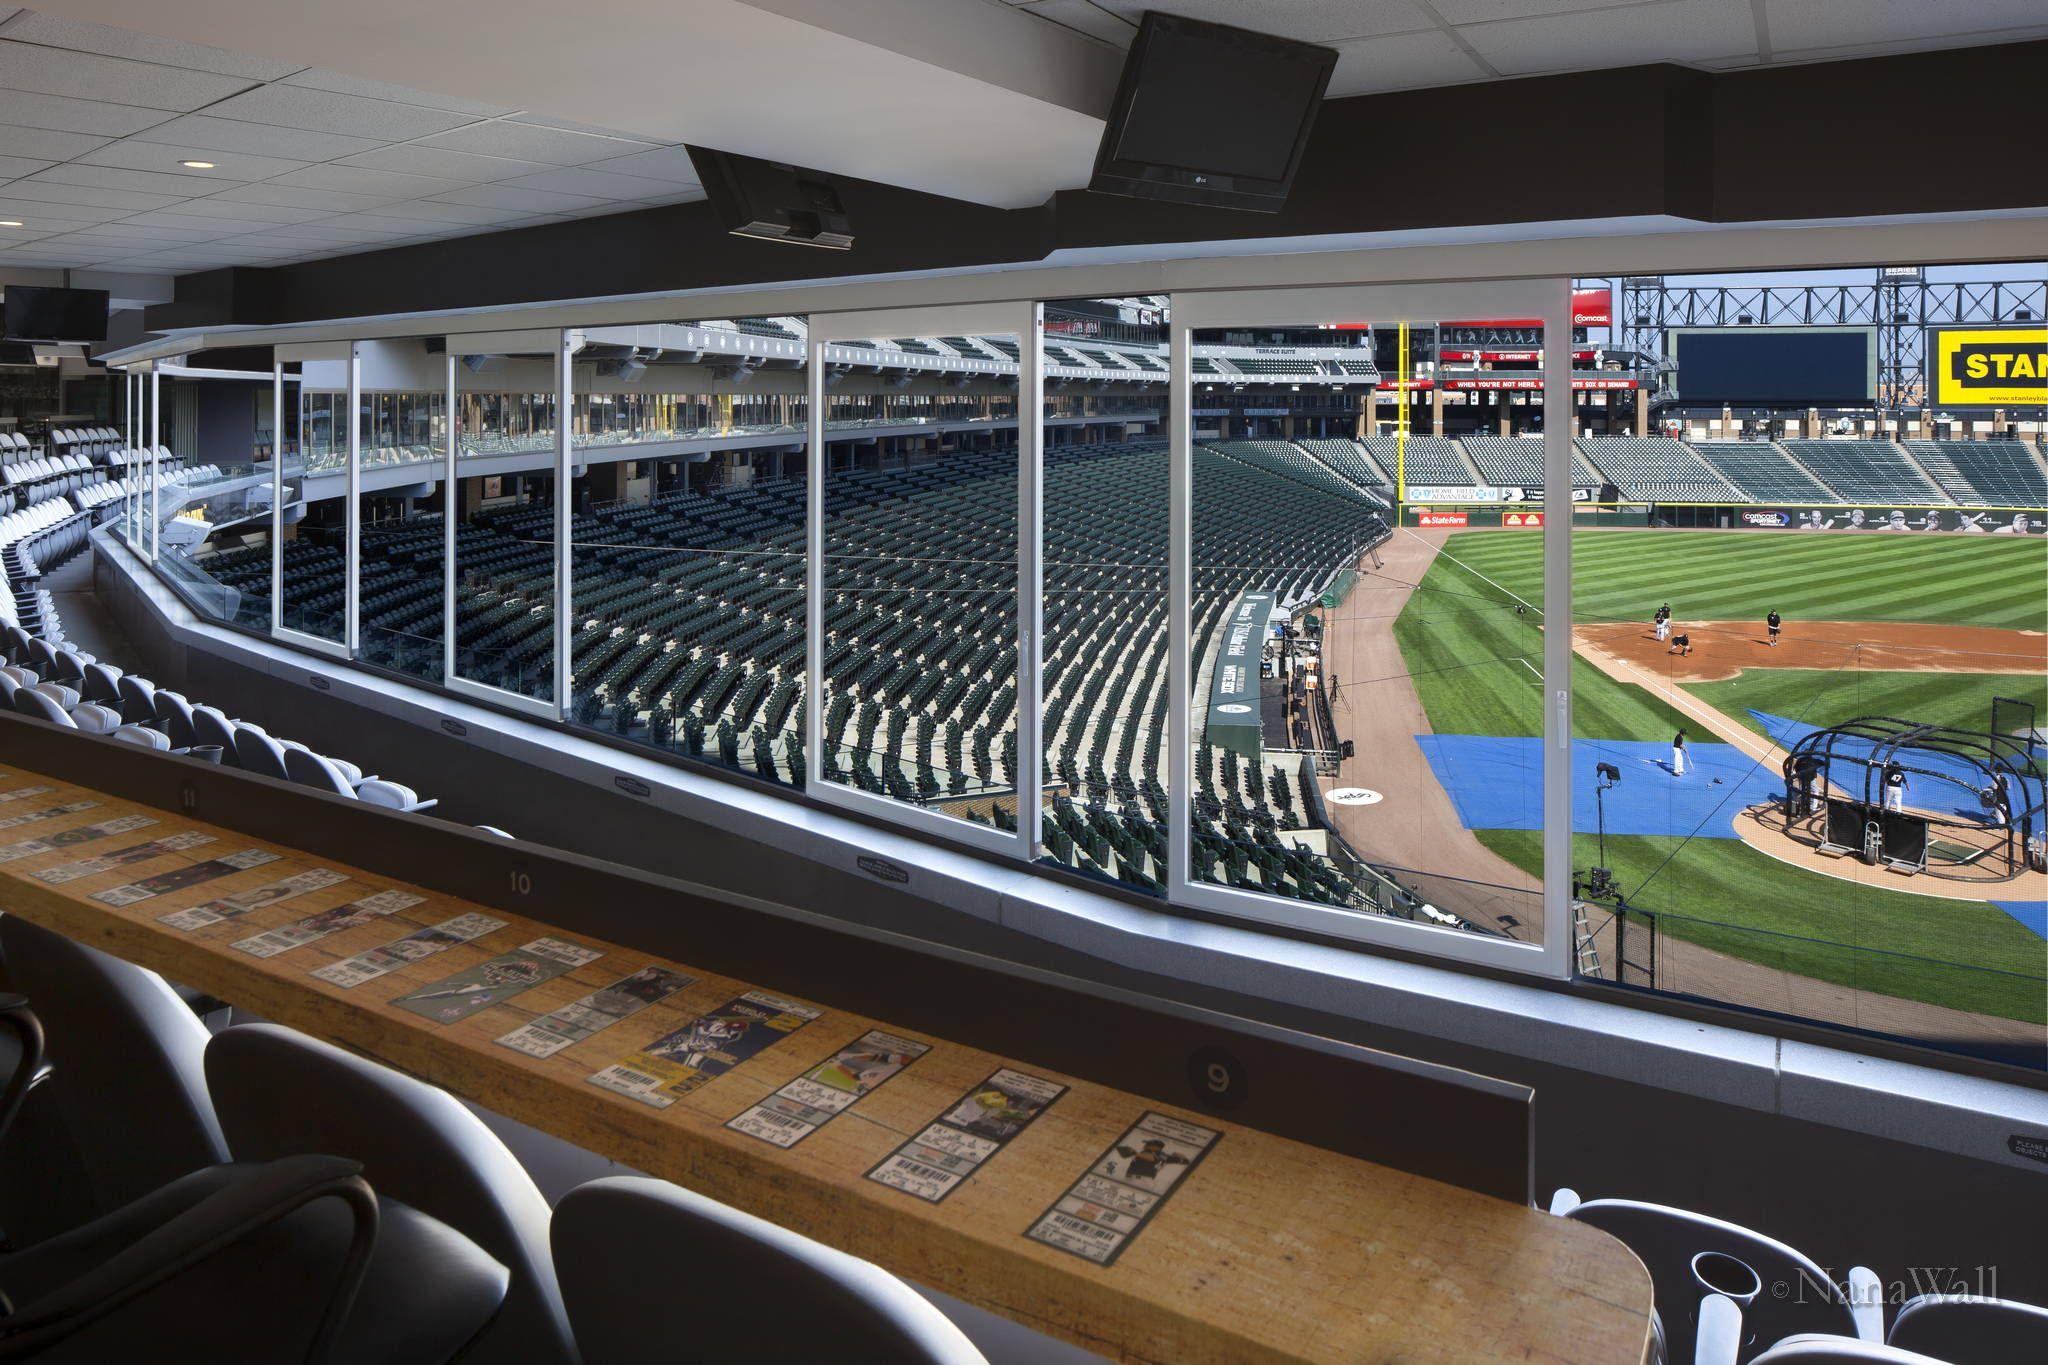 Chicago White Sox Stadium Nanawall In 2020 School Building Design Chicago White Sox Stadium Chicago White Sox